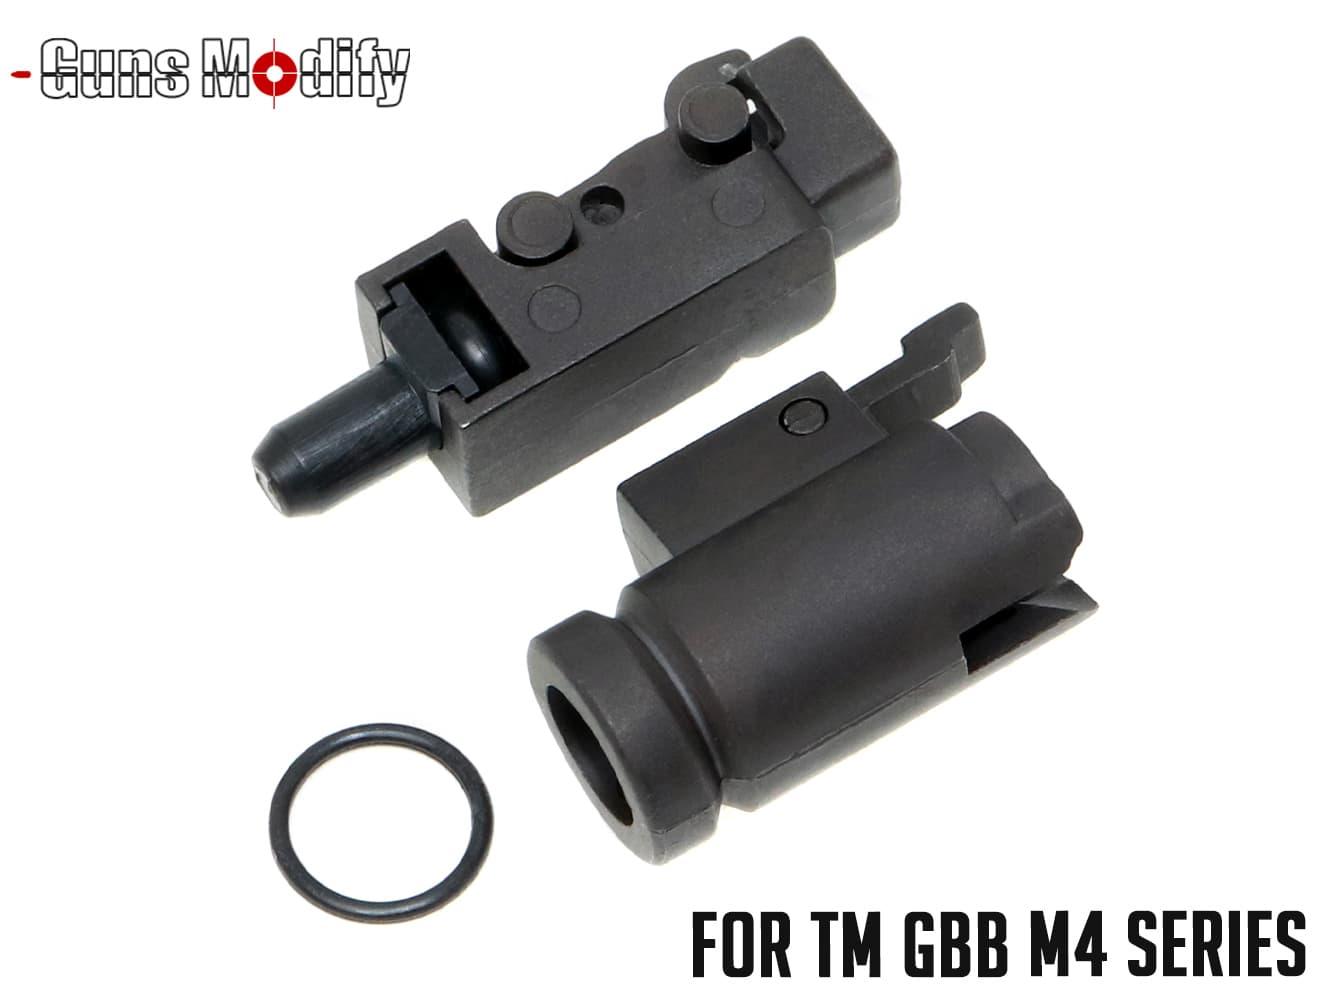 Guns Modify 亜鉛ダイキャスト ホップアップチャンバー&アジャスターセット for TM GBB M4◆マルイ ガスブロ M4MWS/MTR-16/CQB-R補修パーツ